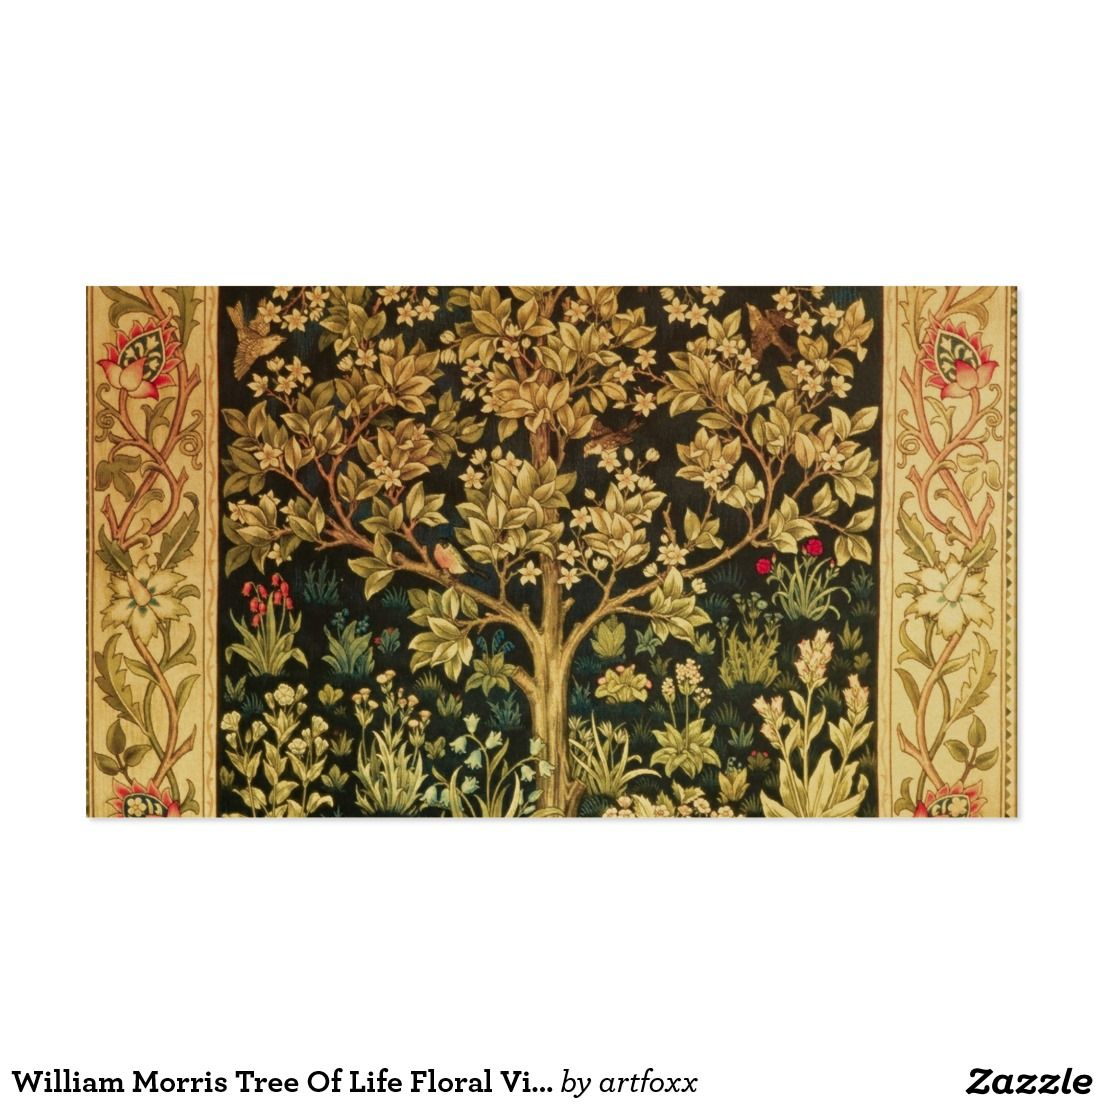 William morris tree of life floral vintage art business card william morris tree of life floral vintage art business card reheart Gallery